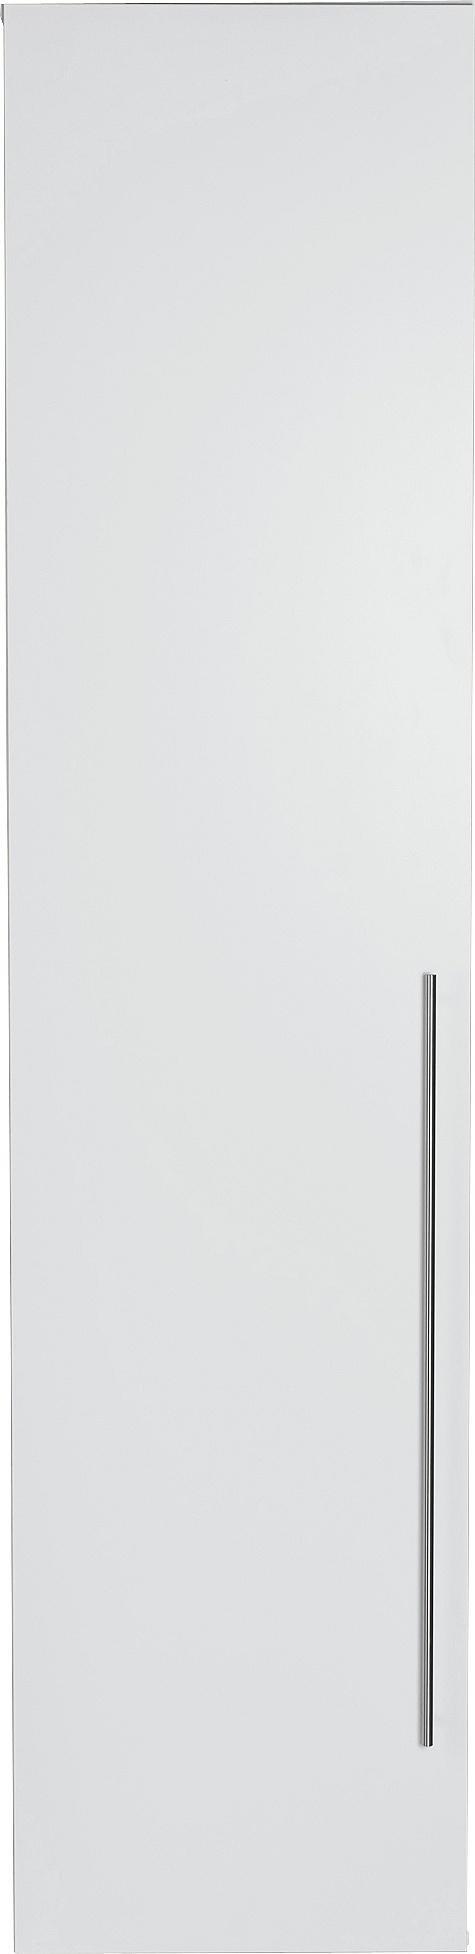 Argos Home Atlas 1 Door Tall Wardrobe - White